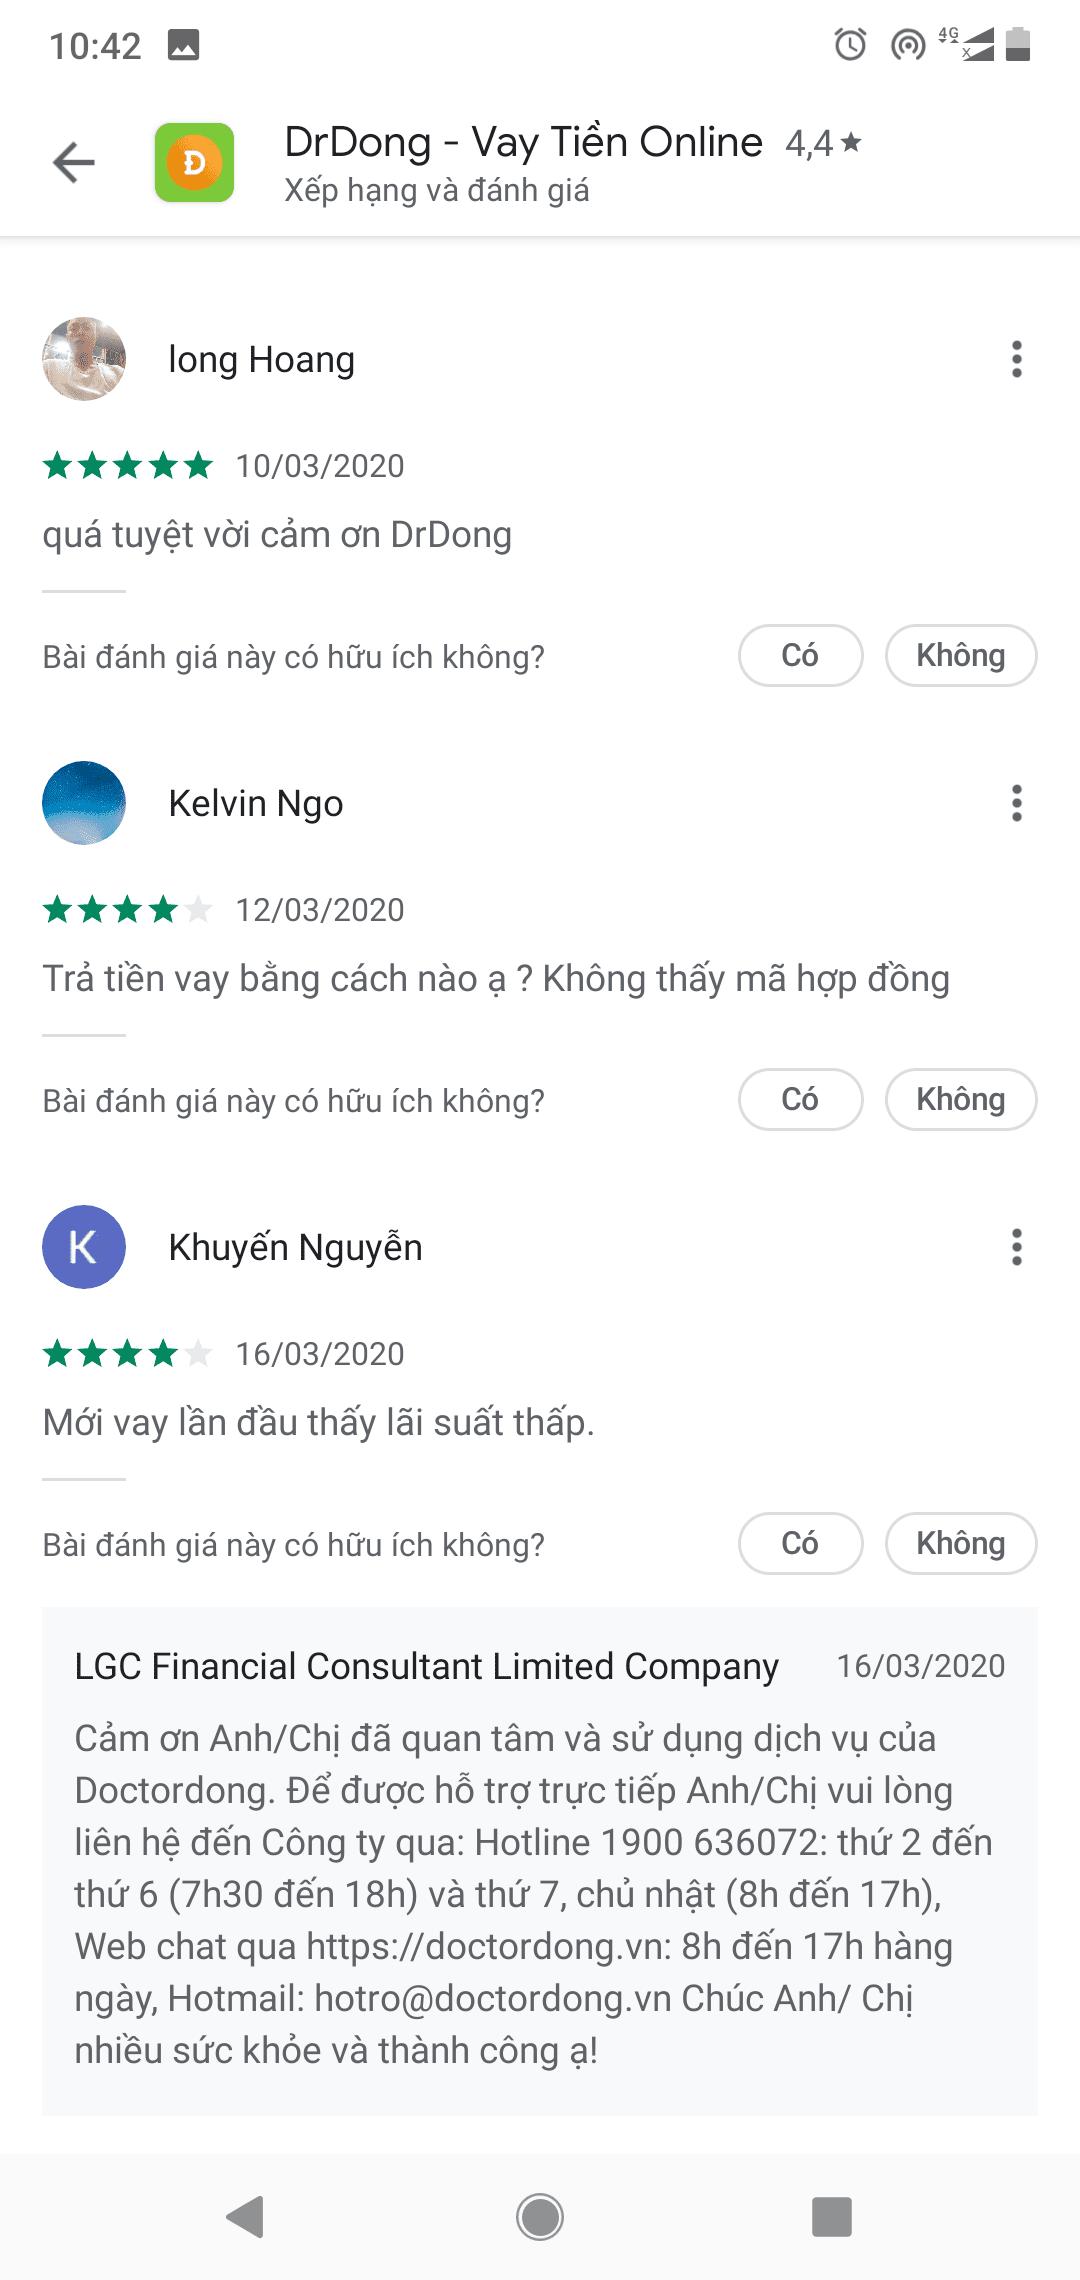 phan-hoi-cua-khach-hang-ve-Doctor-dong